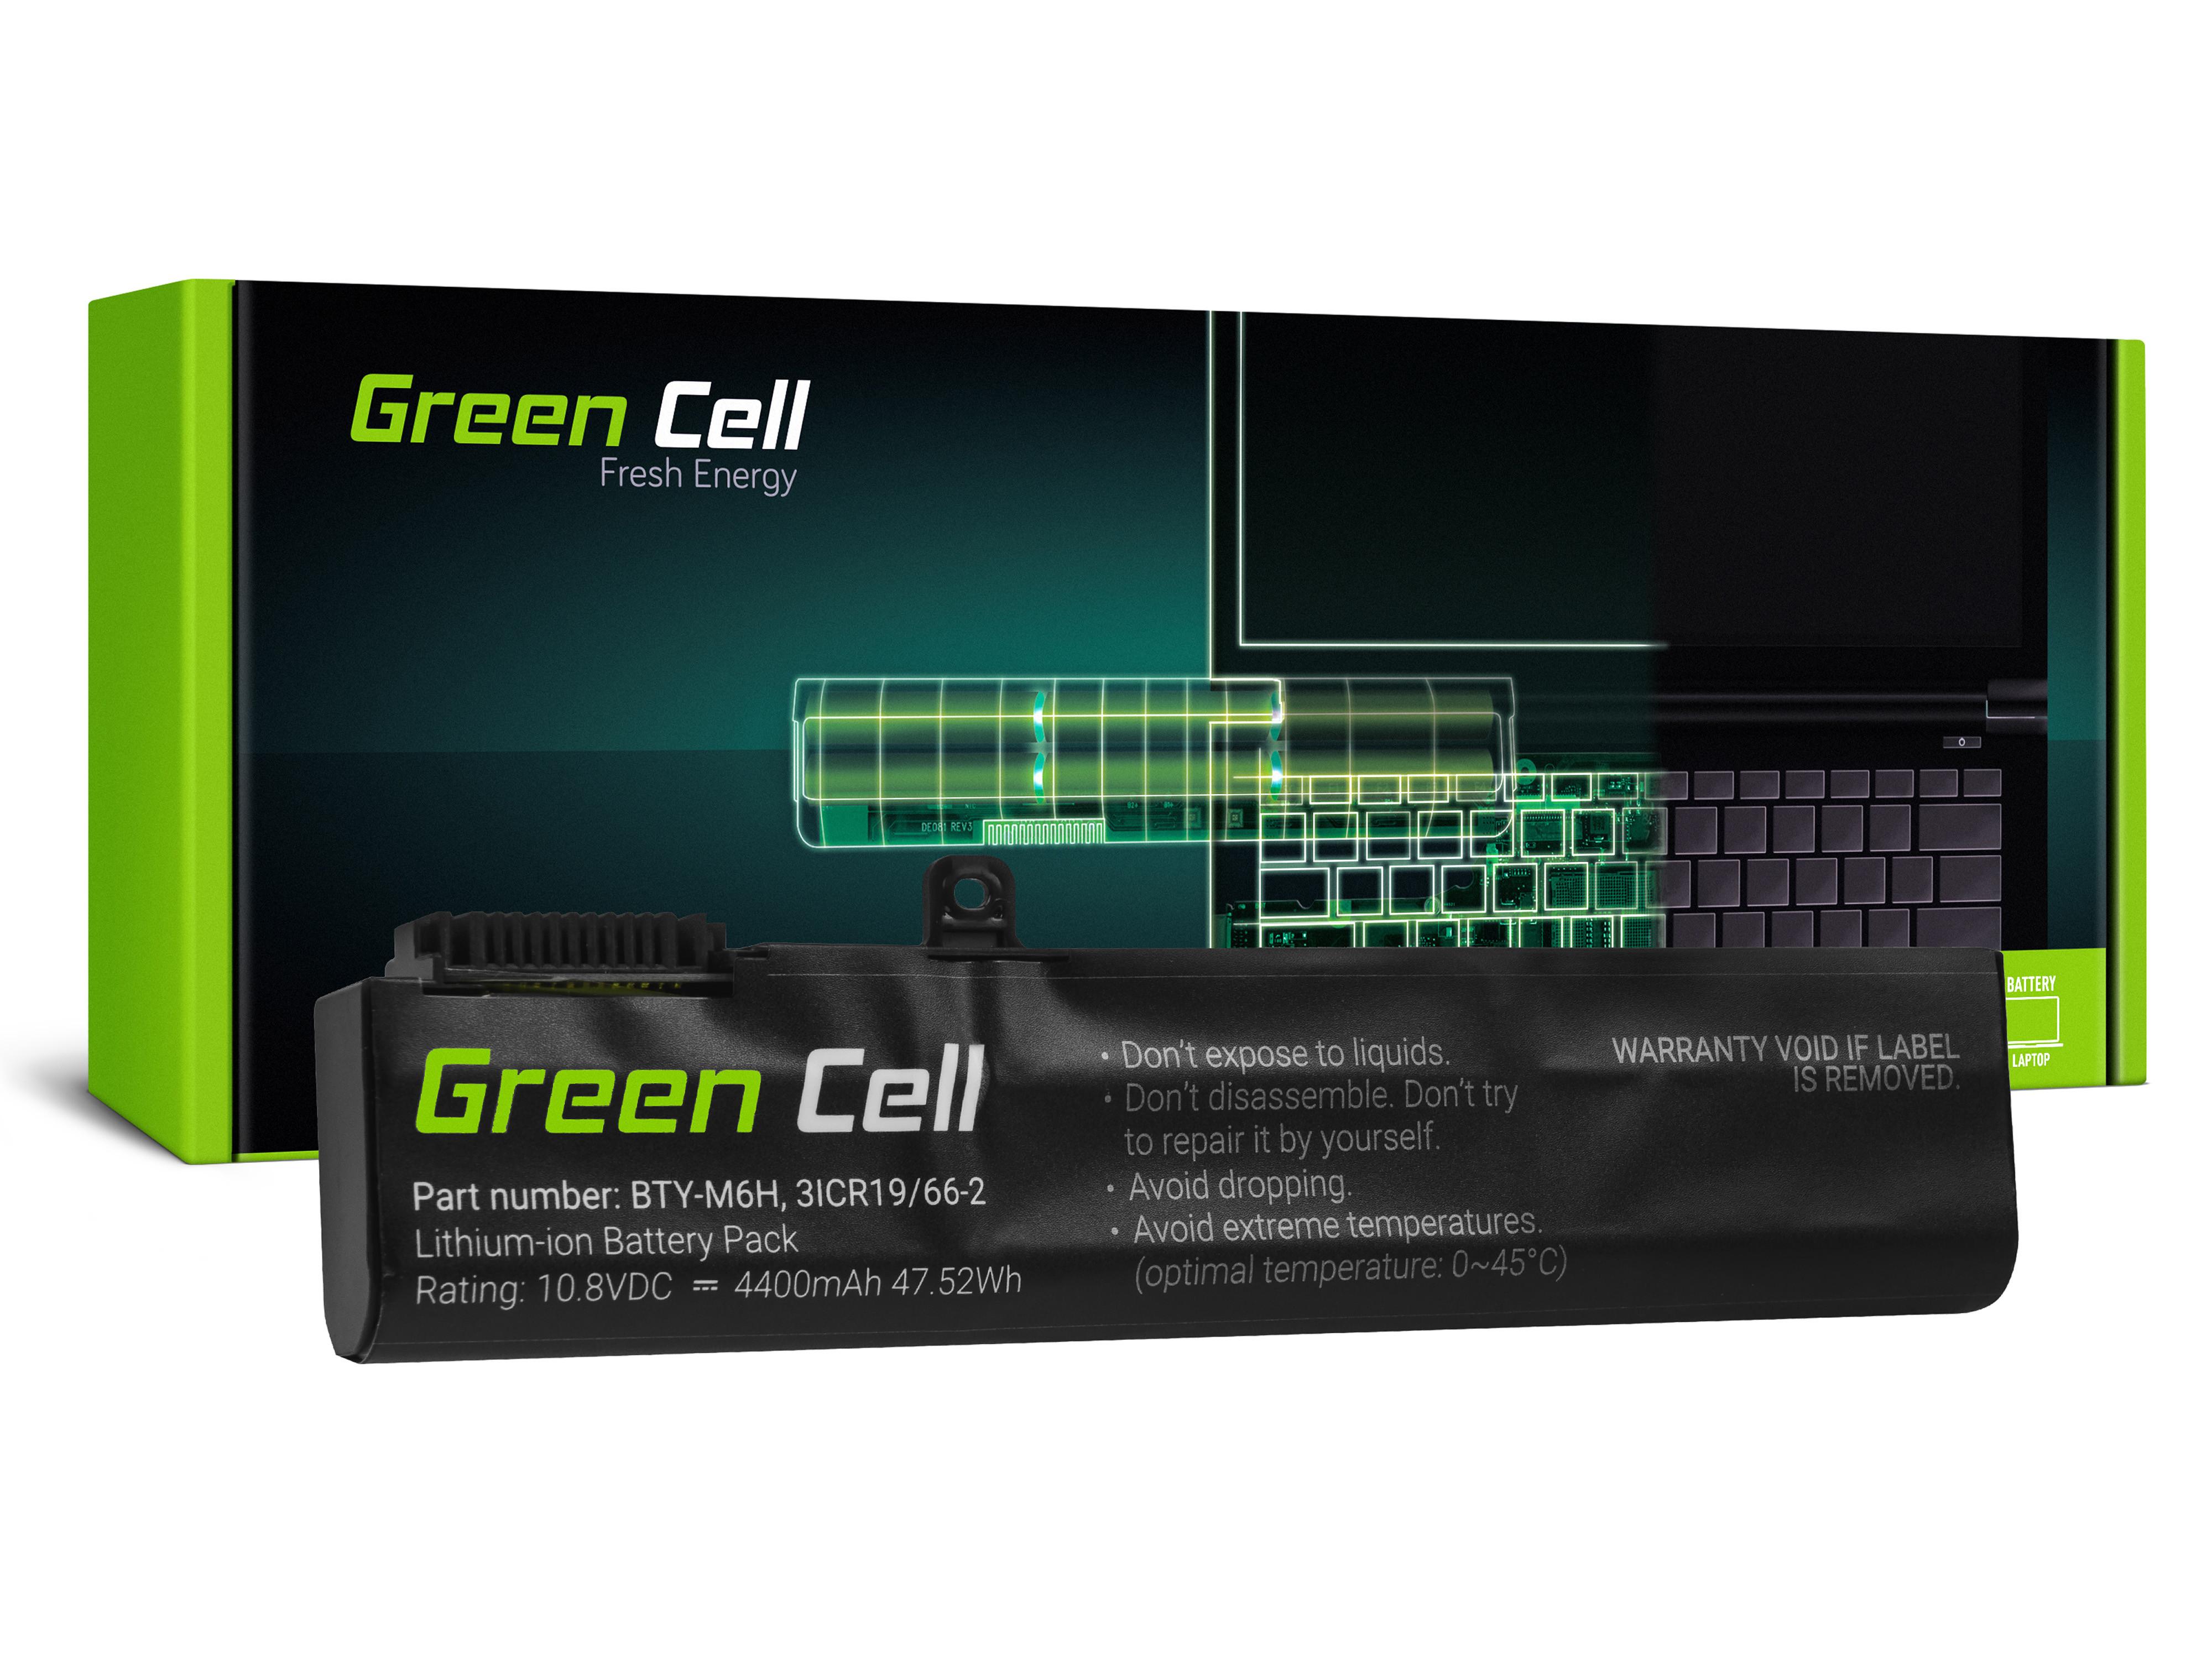 Batteri BTY-M6H gör MSI GE62 GE63 GE72 GE73 GE75 GL62 GL63 GL73 GL65 GL72 GP62 GP63 GP72 GP73 GV62 GV72 PE60 PE70